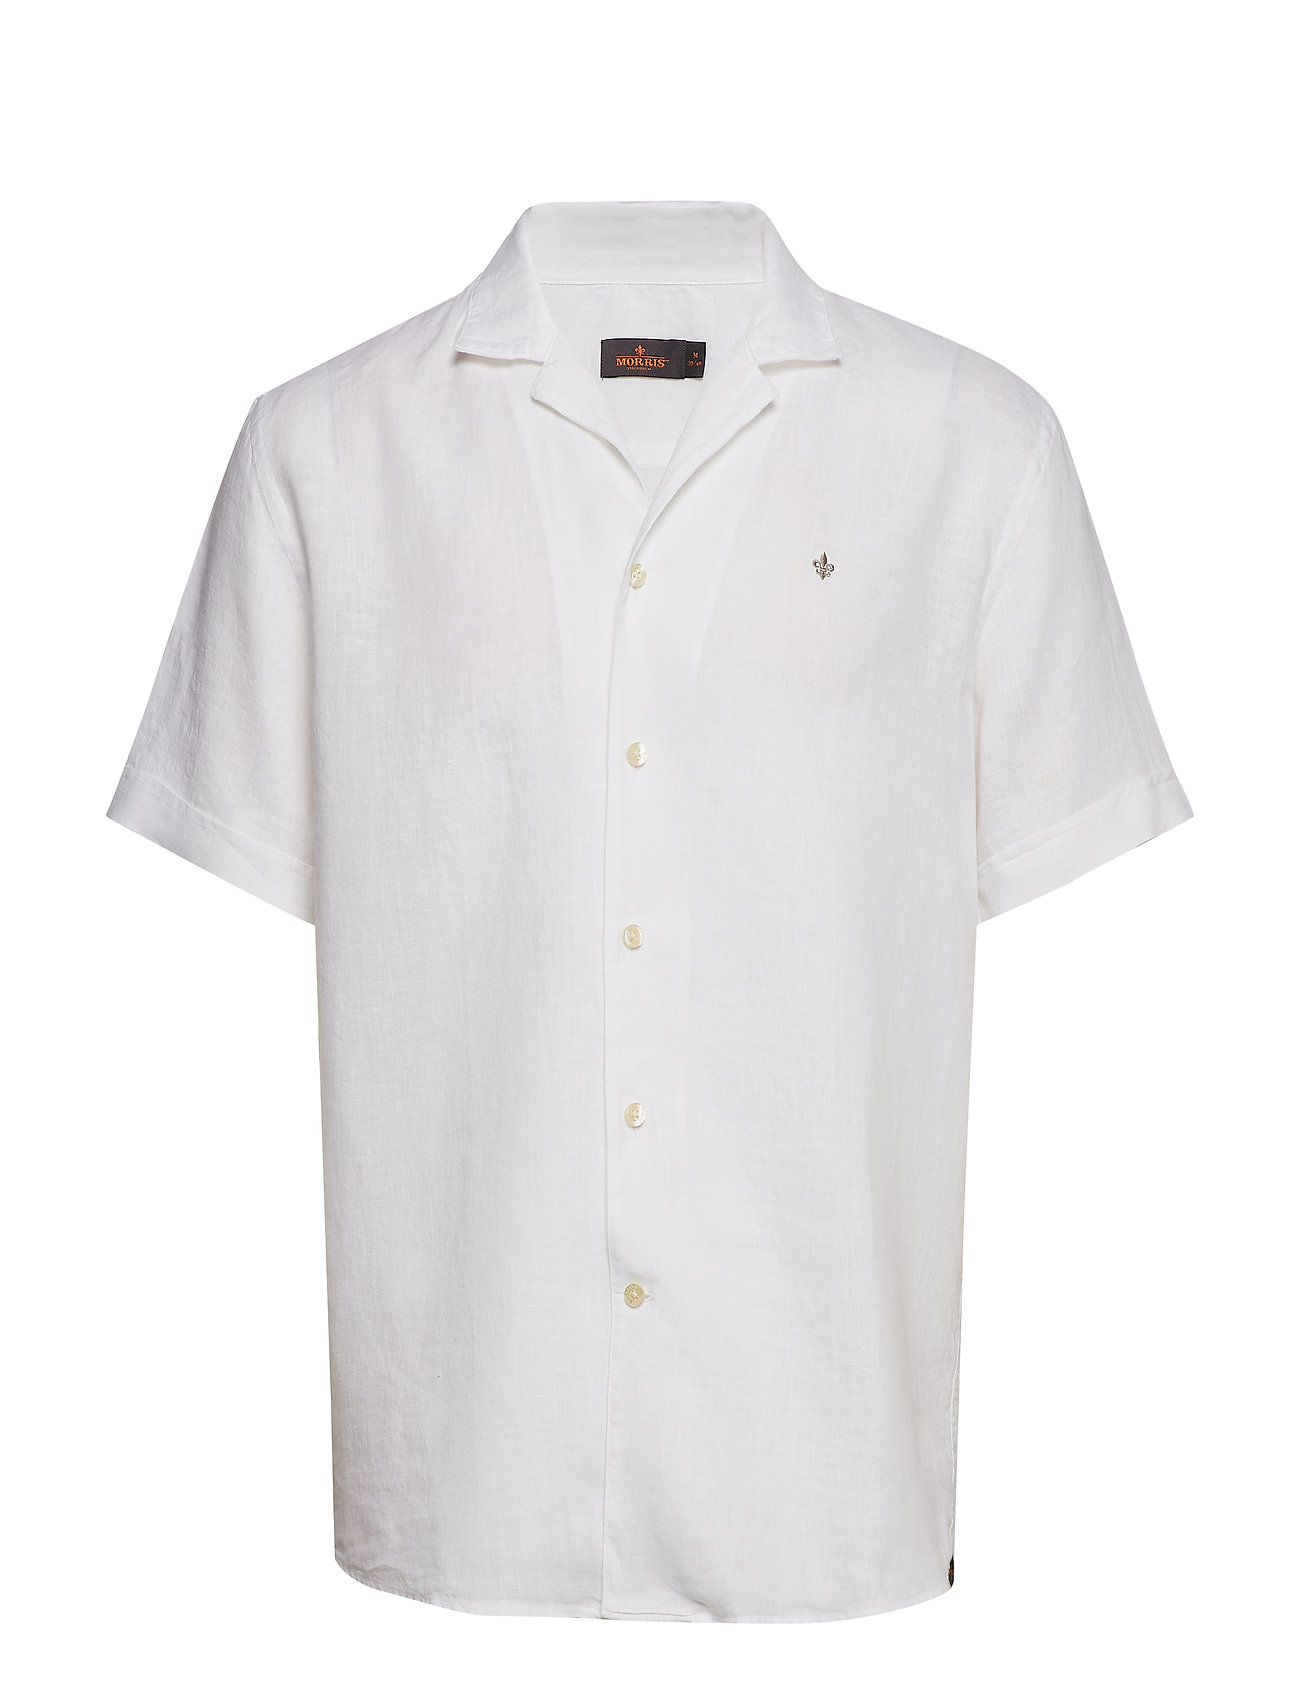 Morris Harper Bowling Linen Shirt - WHITE